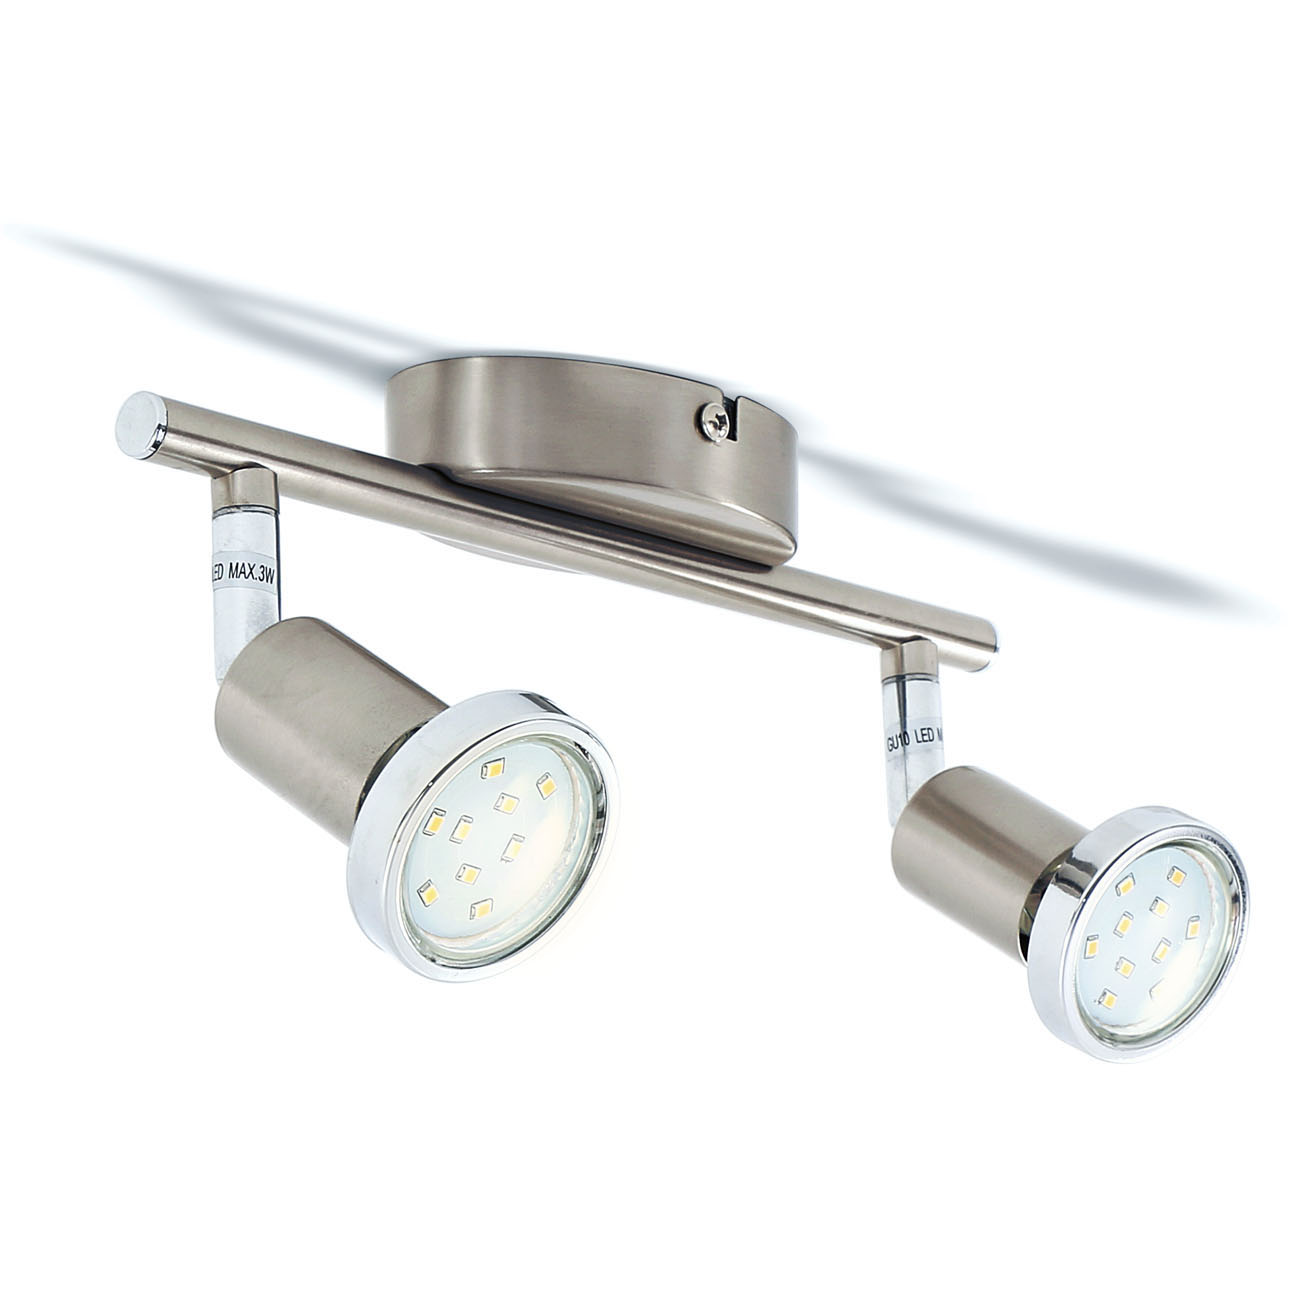 LED Deckenstrahler 2-flammig - 1